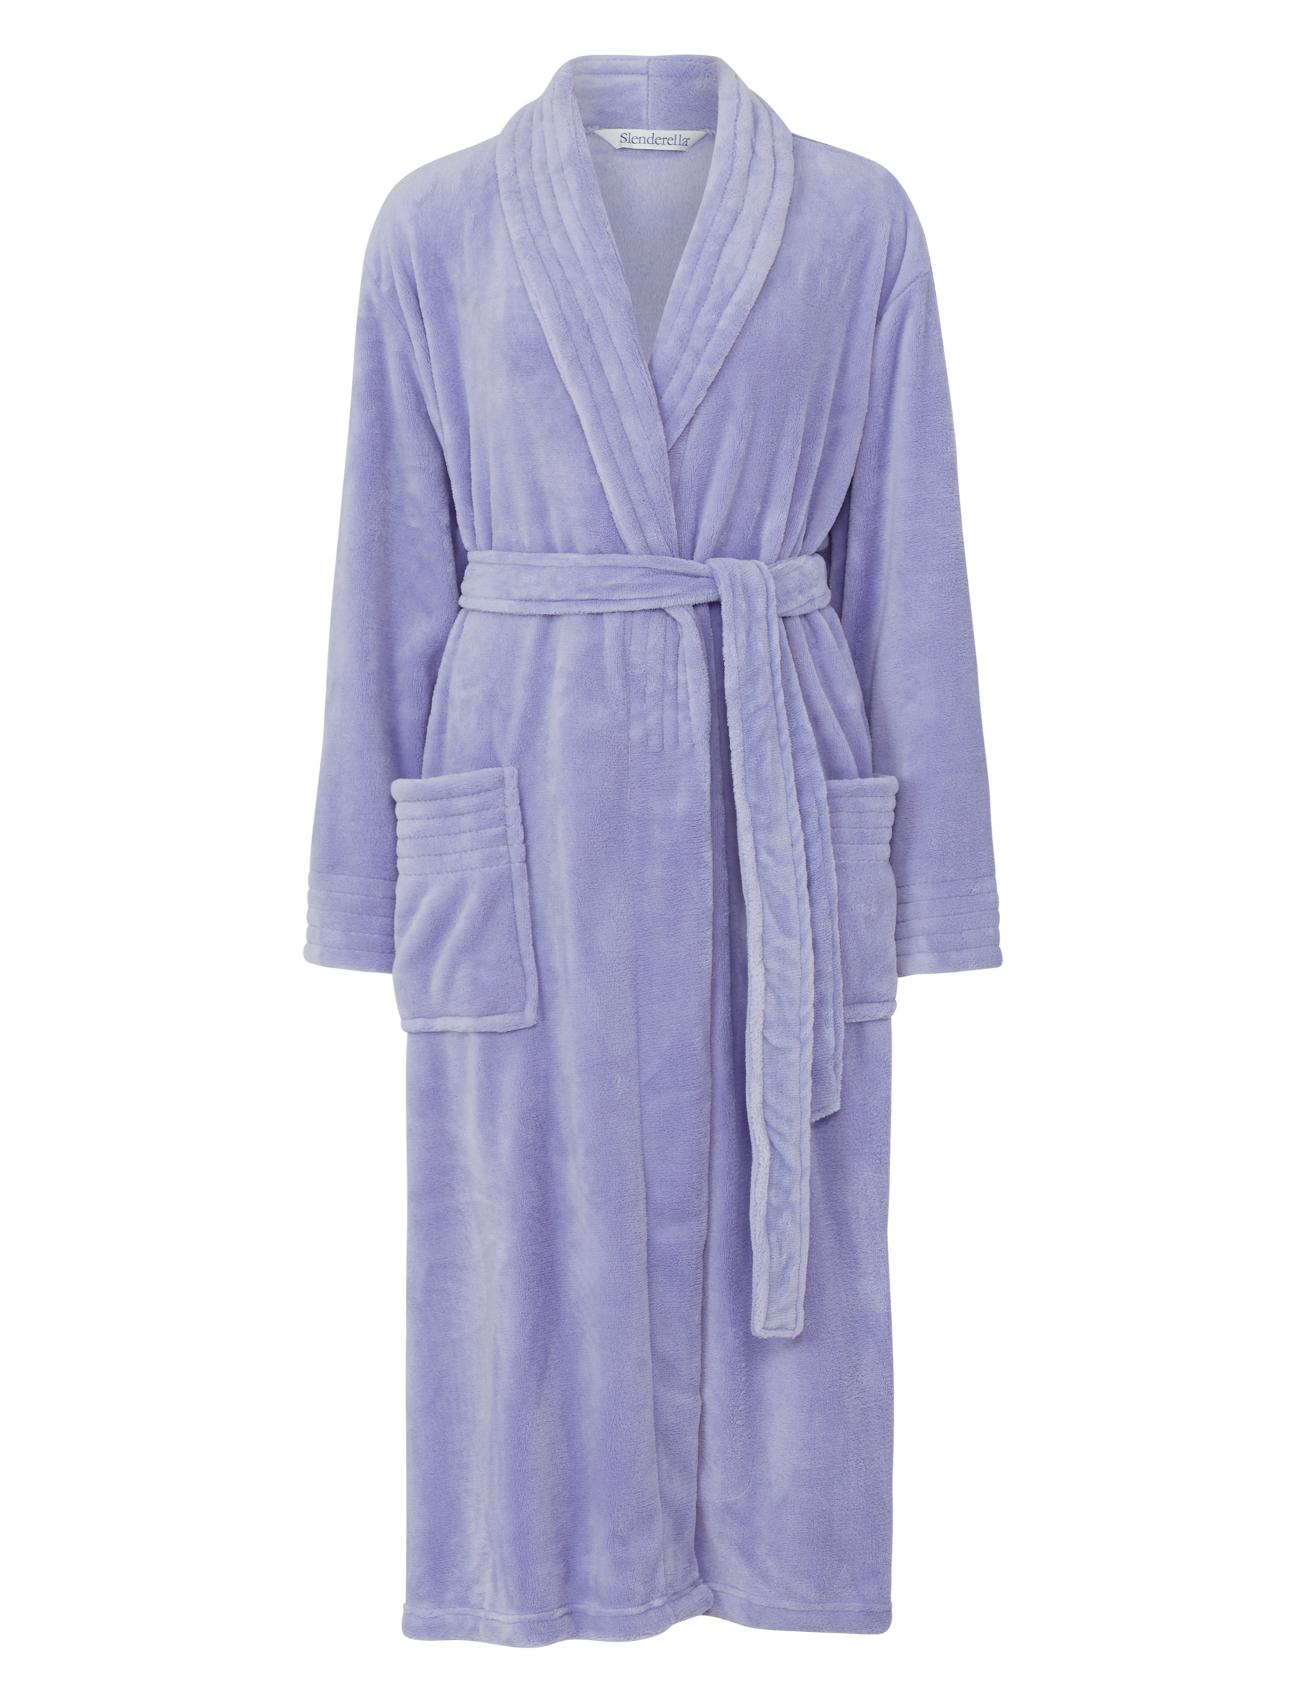 slenderella femmes enveloppant polaire souple robe de chambre de luxe col ch le ebay. Black Bedroom Furniture Sets. Home Design Ideas